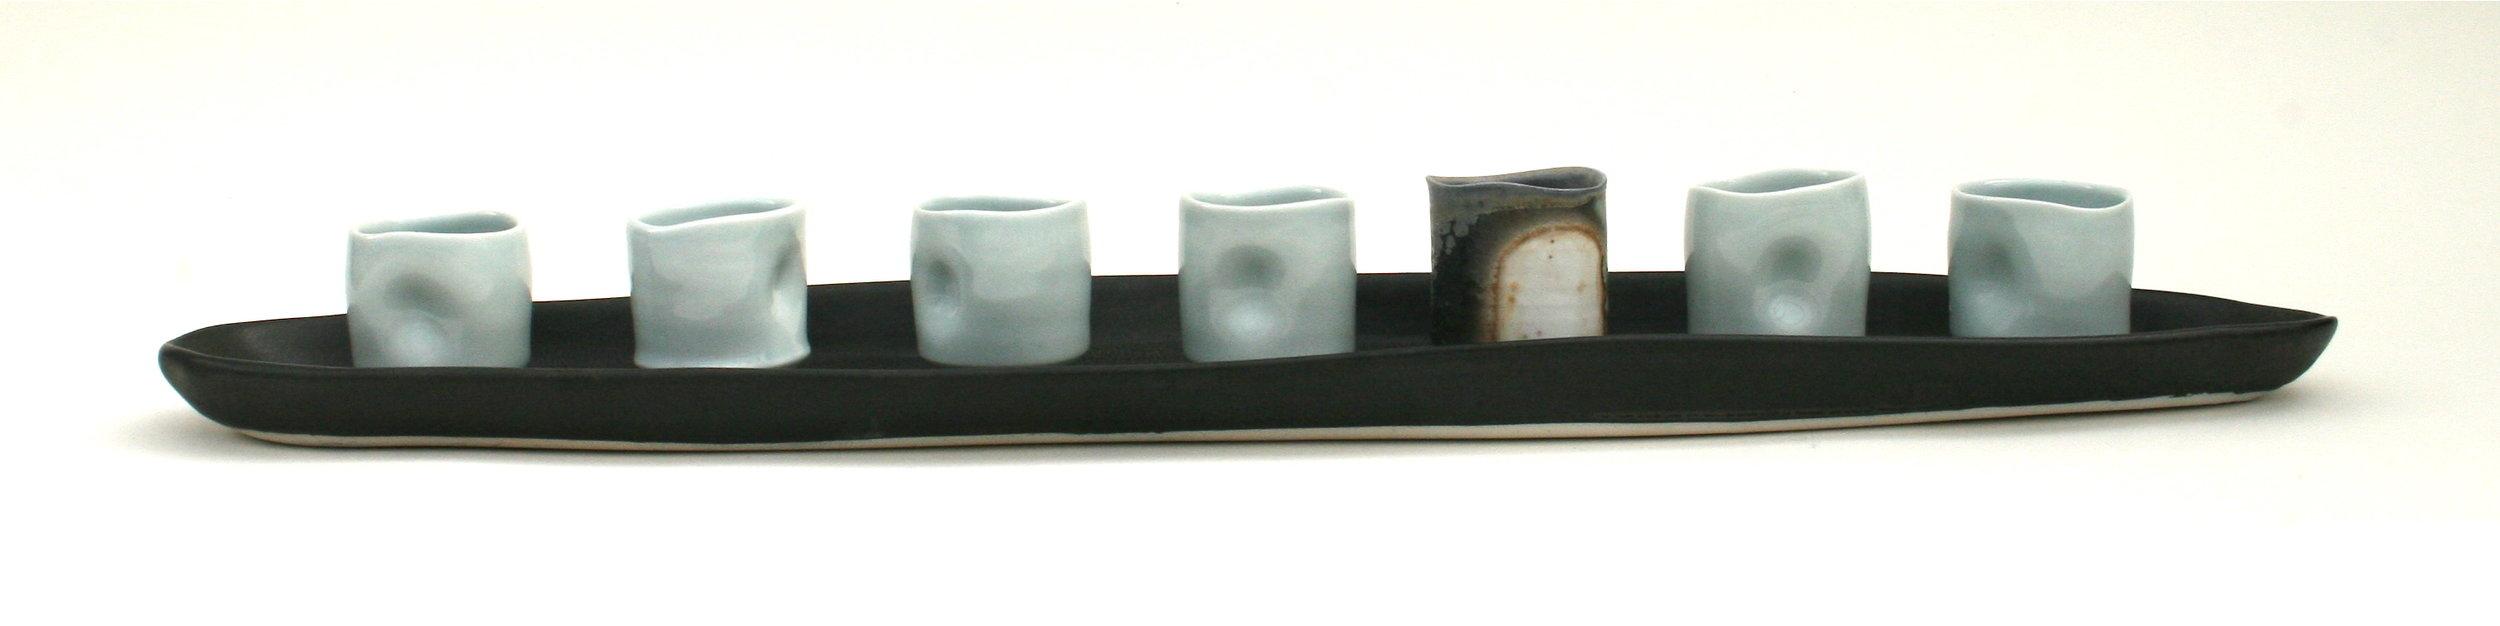 Brown, Sarah Platter with Cups 24.5x5x2.5.JPG